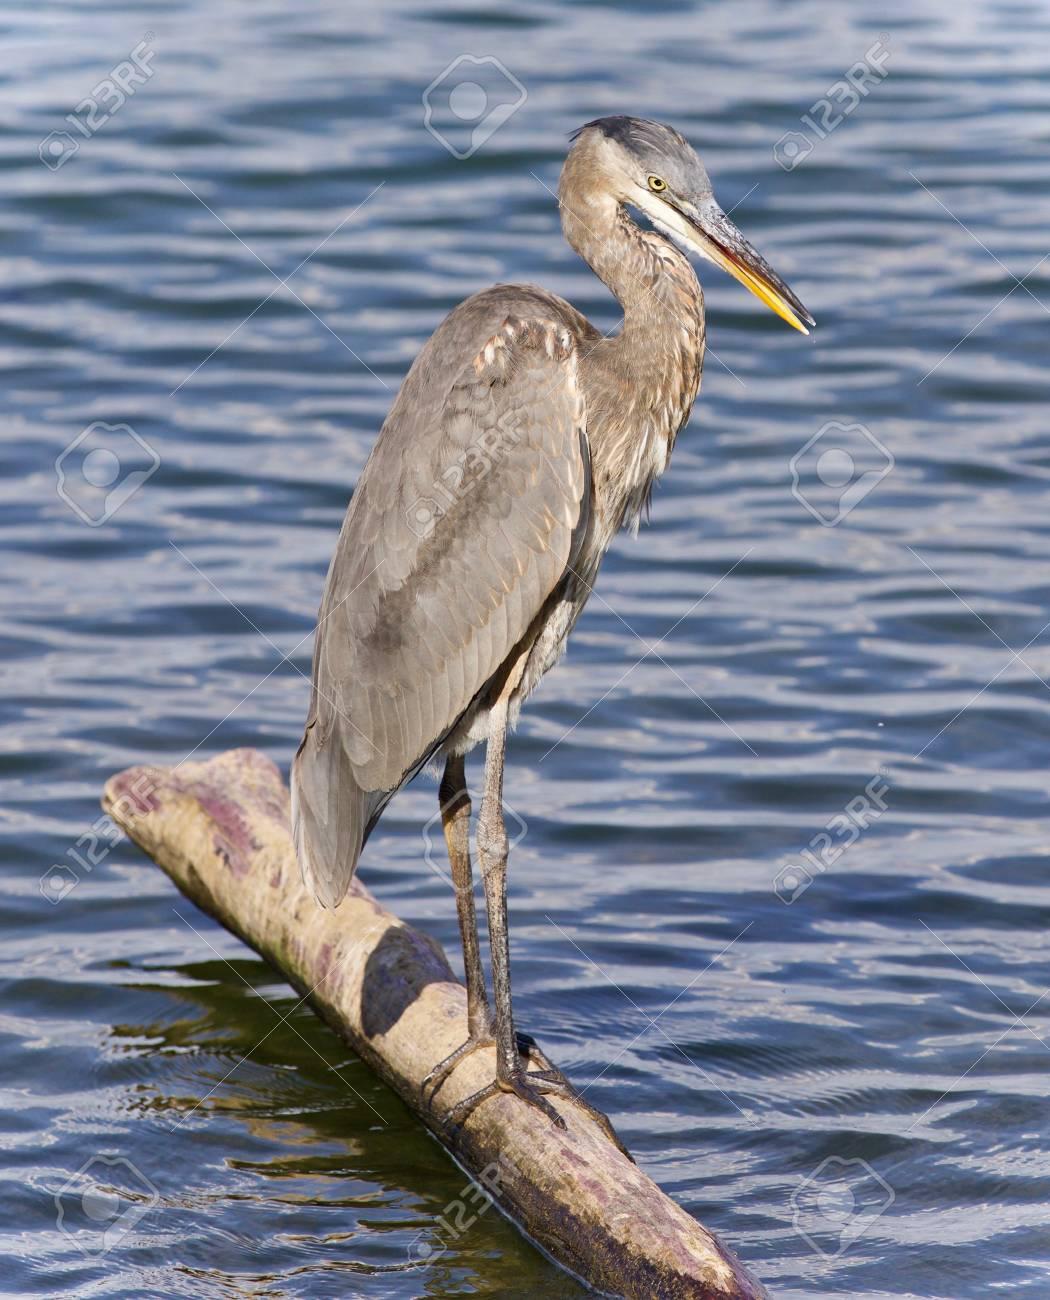 Great Blue Heron Standing